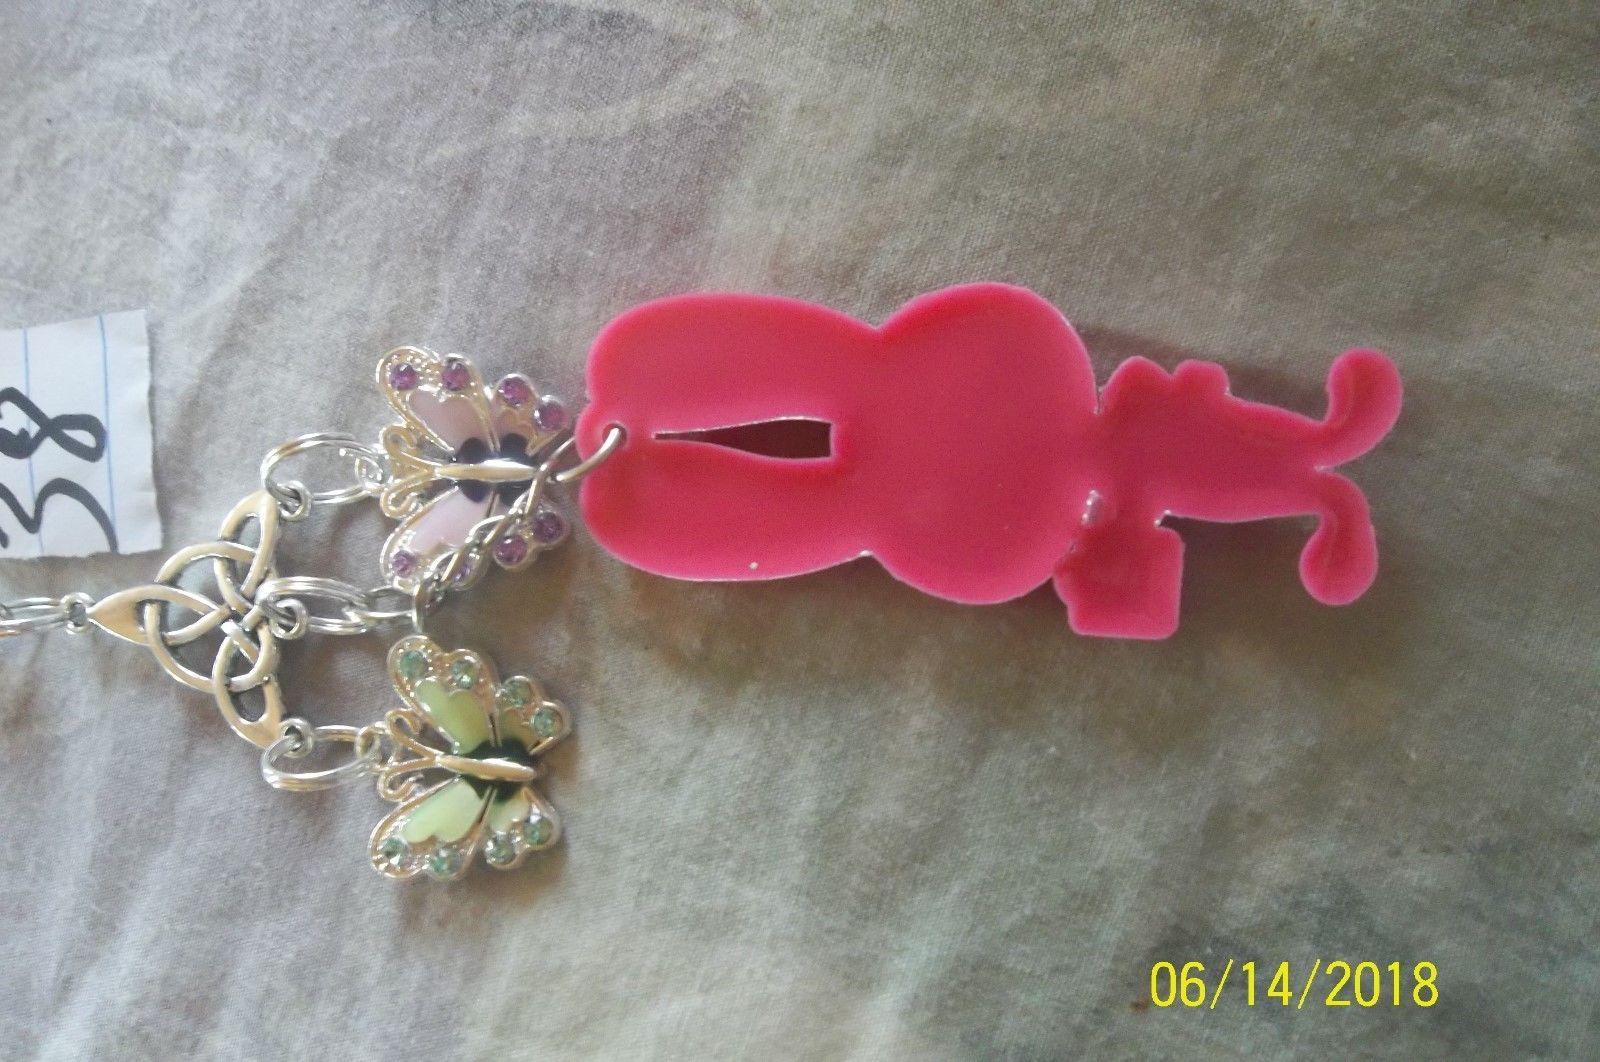 # purse jewlrey silver color Hopps  keychain backpack filigree dangle charm #38 image 4